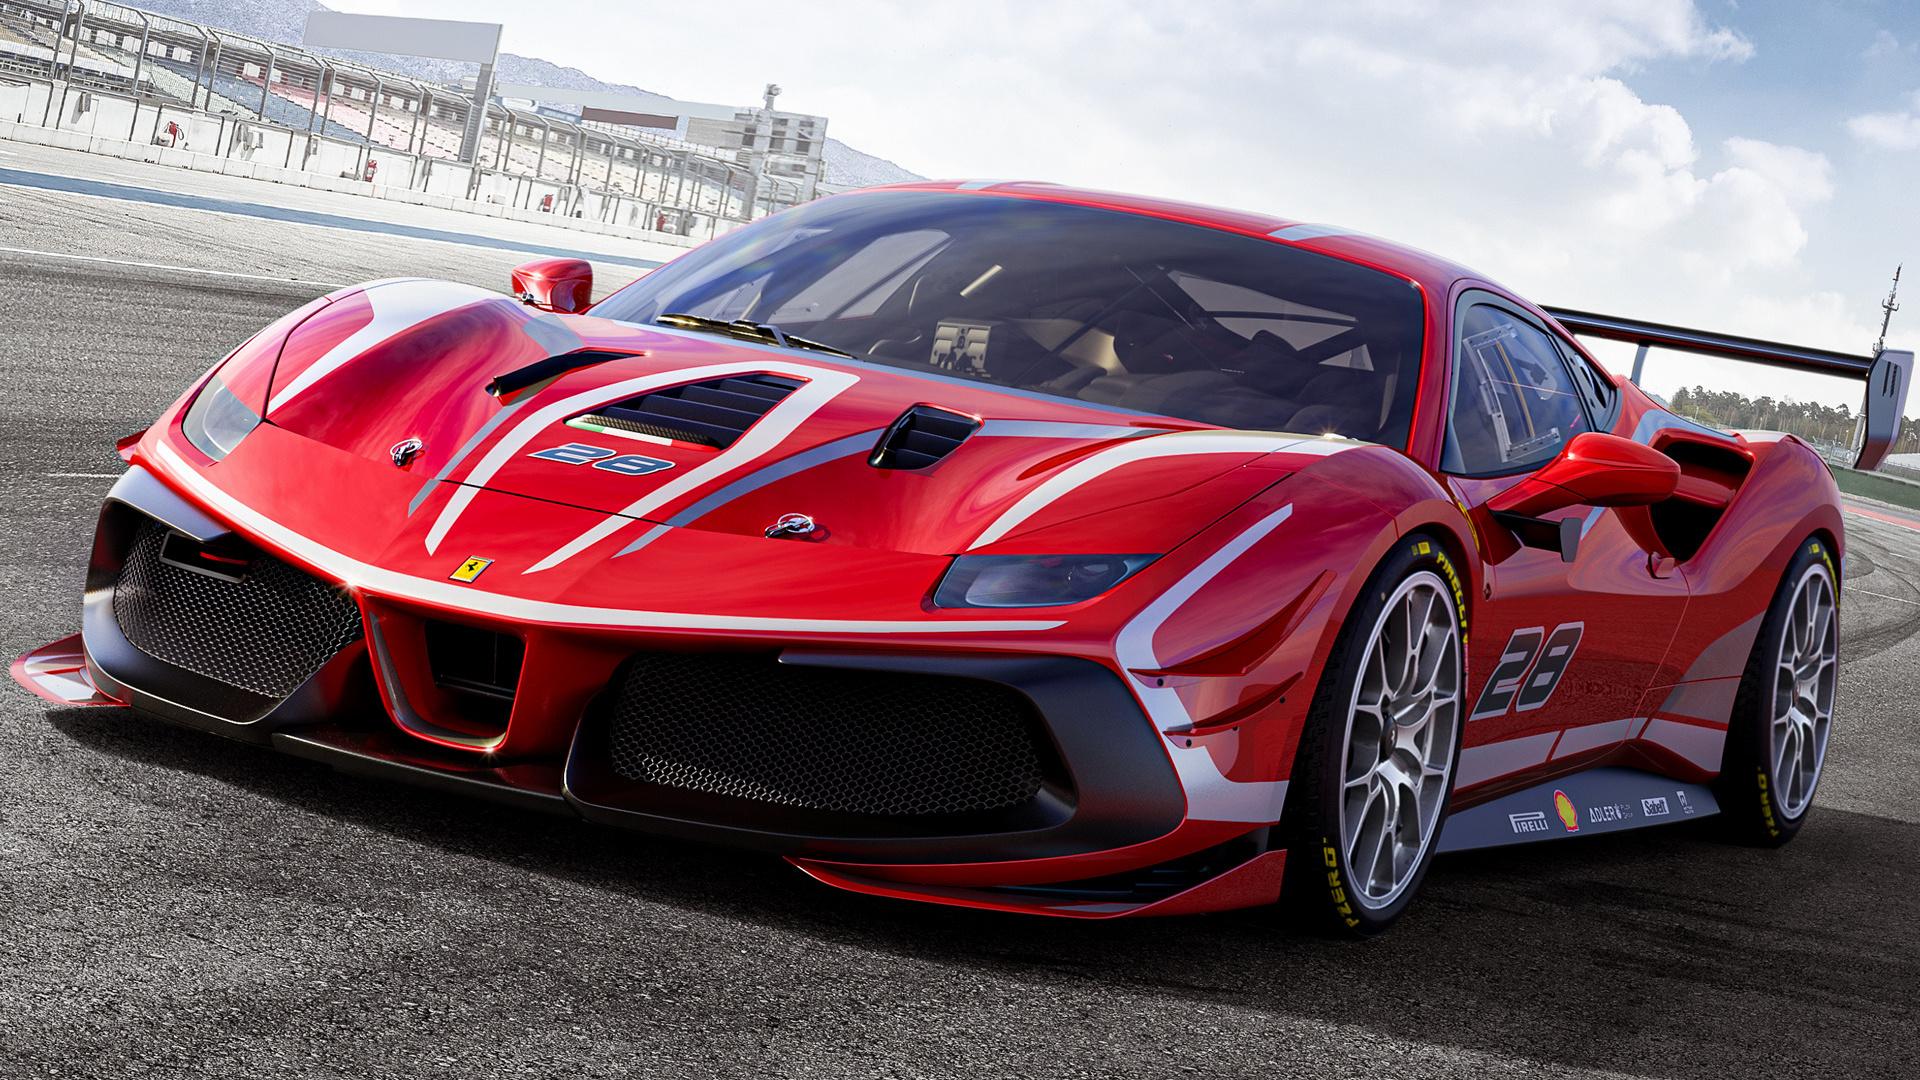 2020 Ferrari 488 Challenge Evo HD Wallpaper Background Image 1920x1080